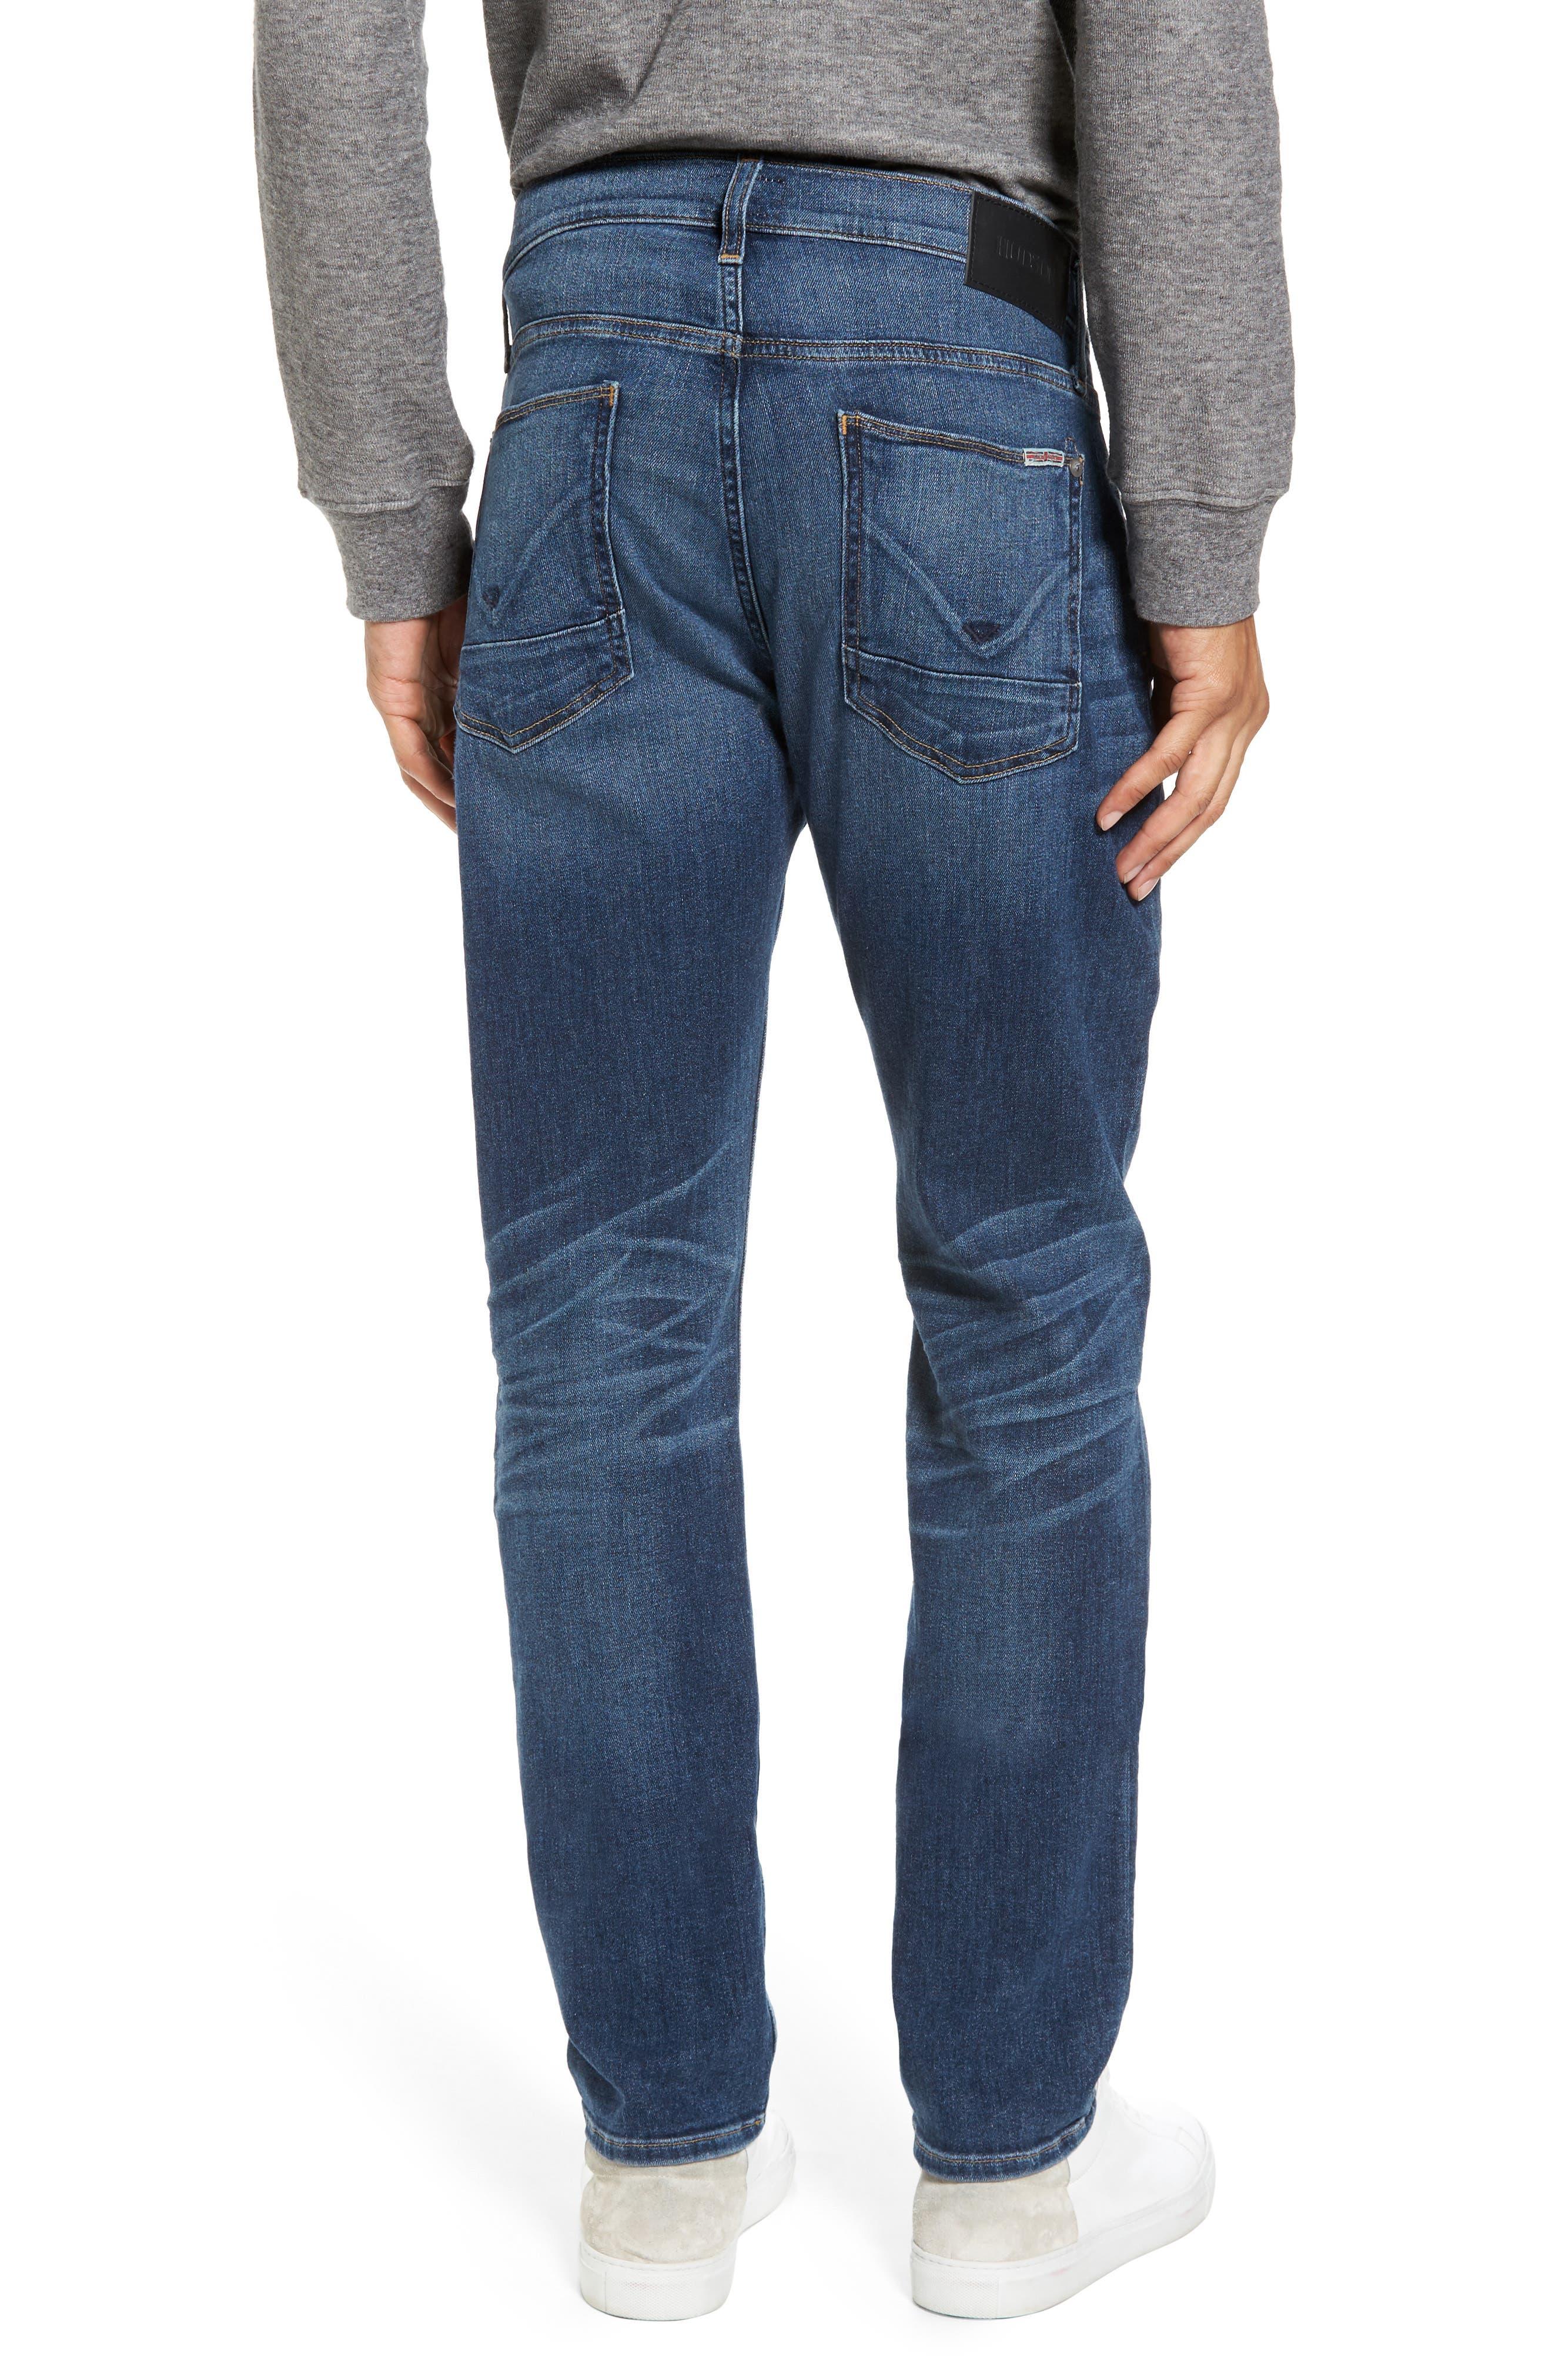 Blake Slim Fit Jeans,                             Alternate thumbnail 2, color,                             Calloway